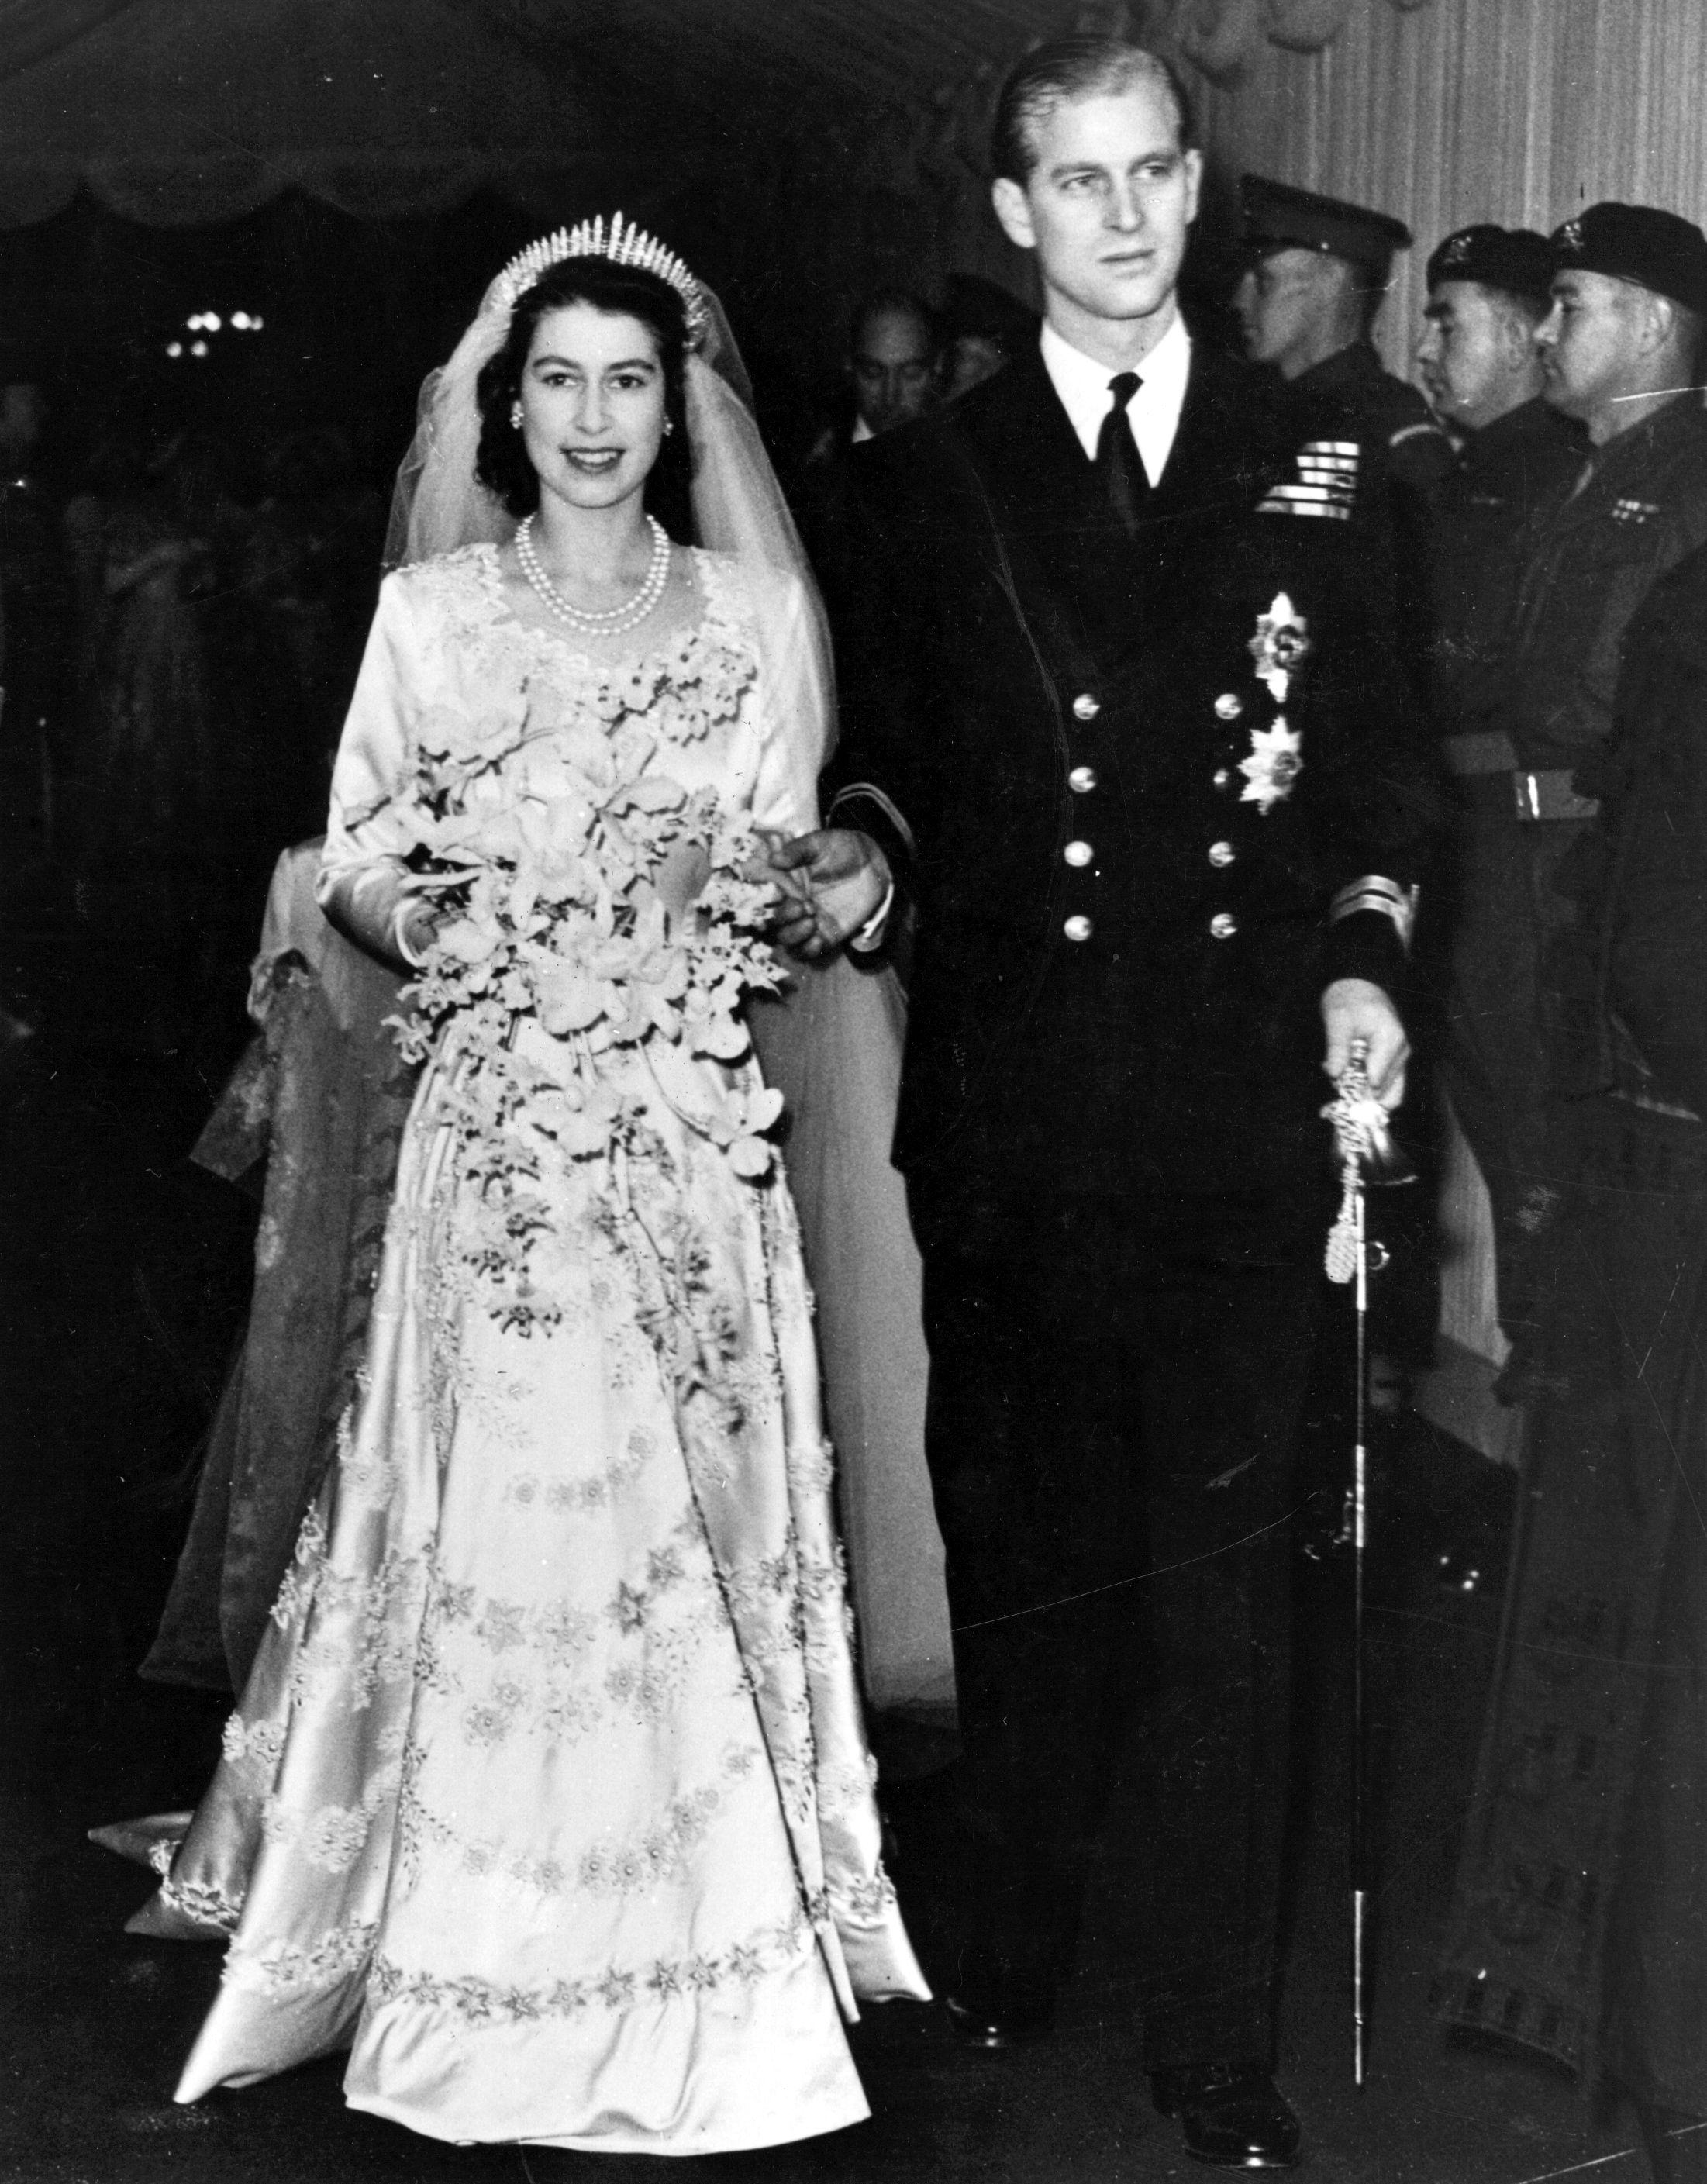 Queen Elizabeth Prince Philip Wedding Getty Images